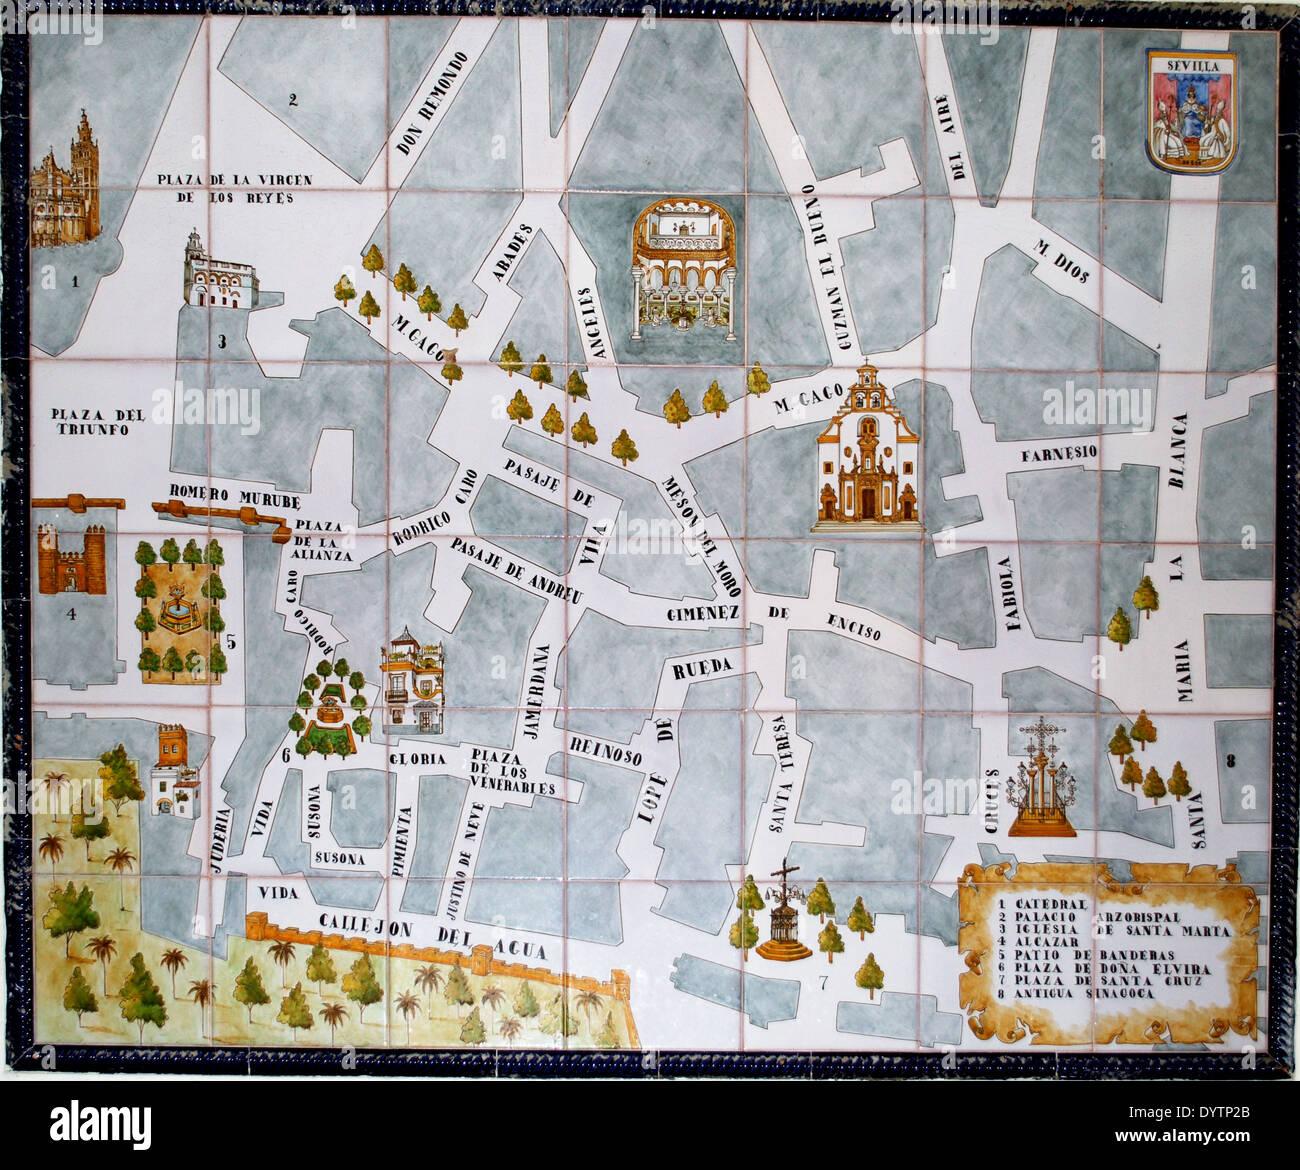 Cartina Siviglia Spagna.Seville Map Spain Immagini E Fotos Stock Alamy